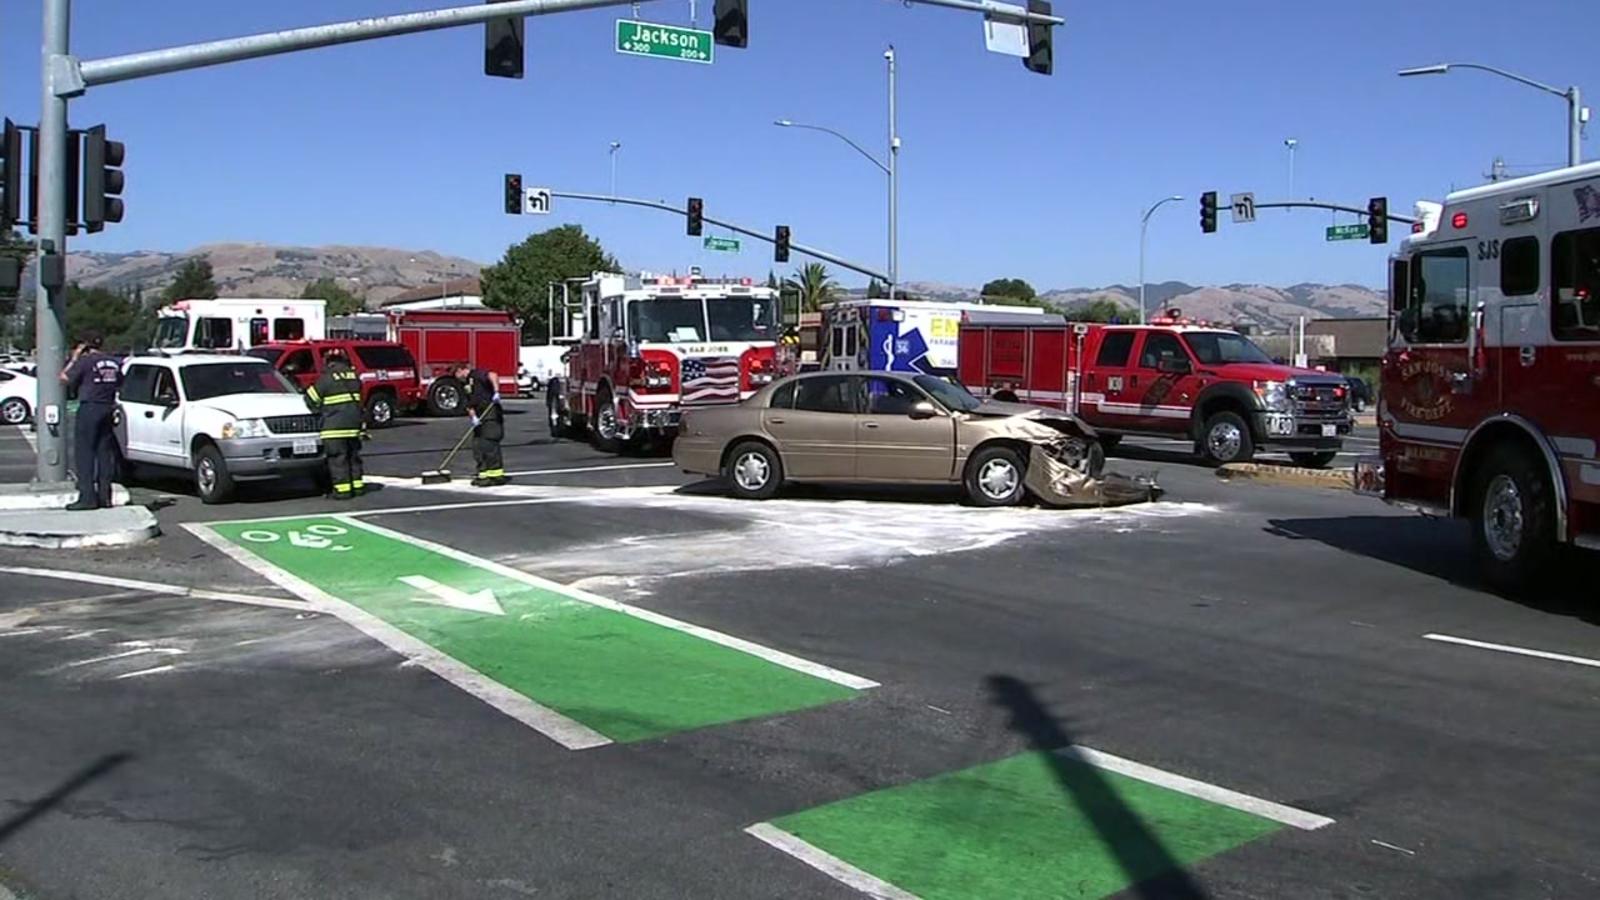 Officer injured in crash involving multiple cars in San Jose